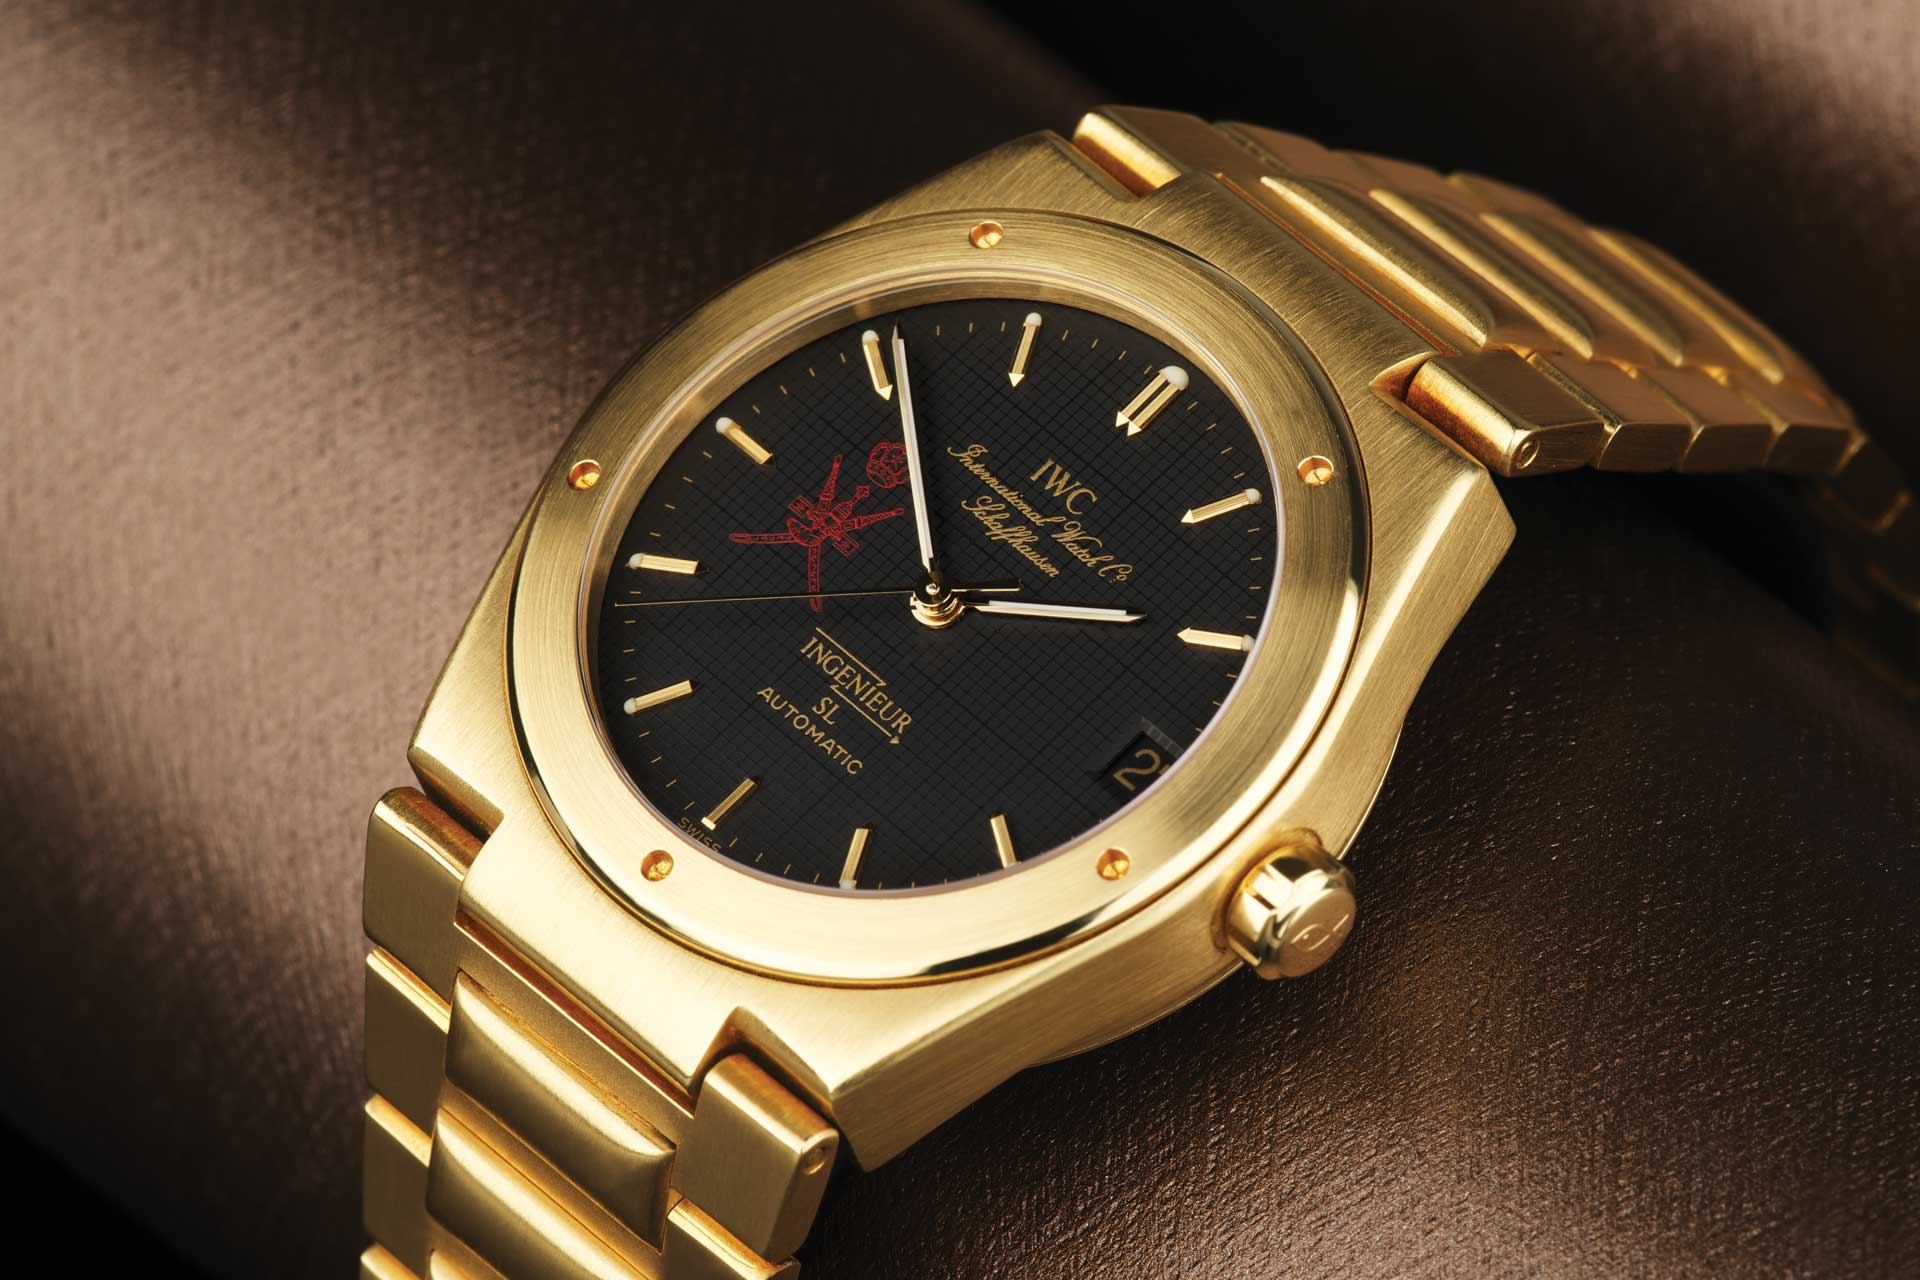 iwc watch company